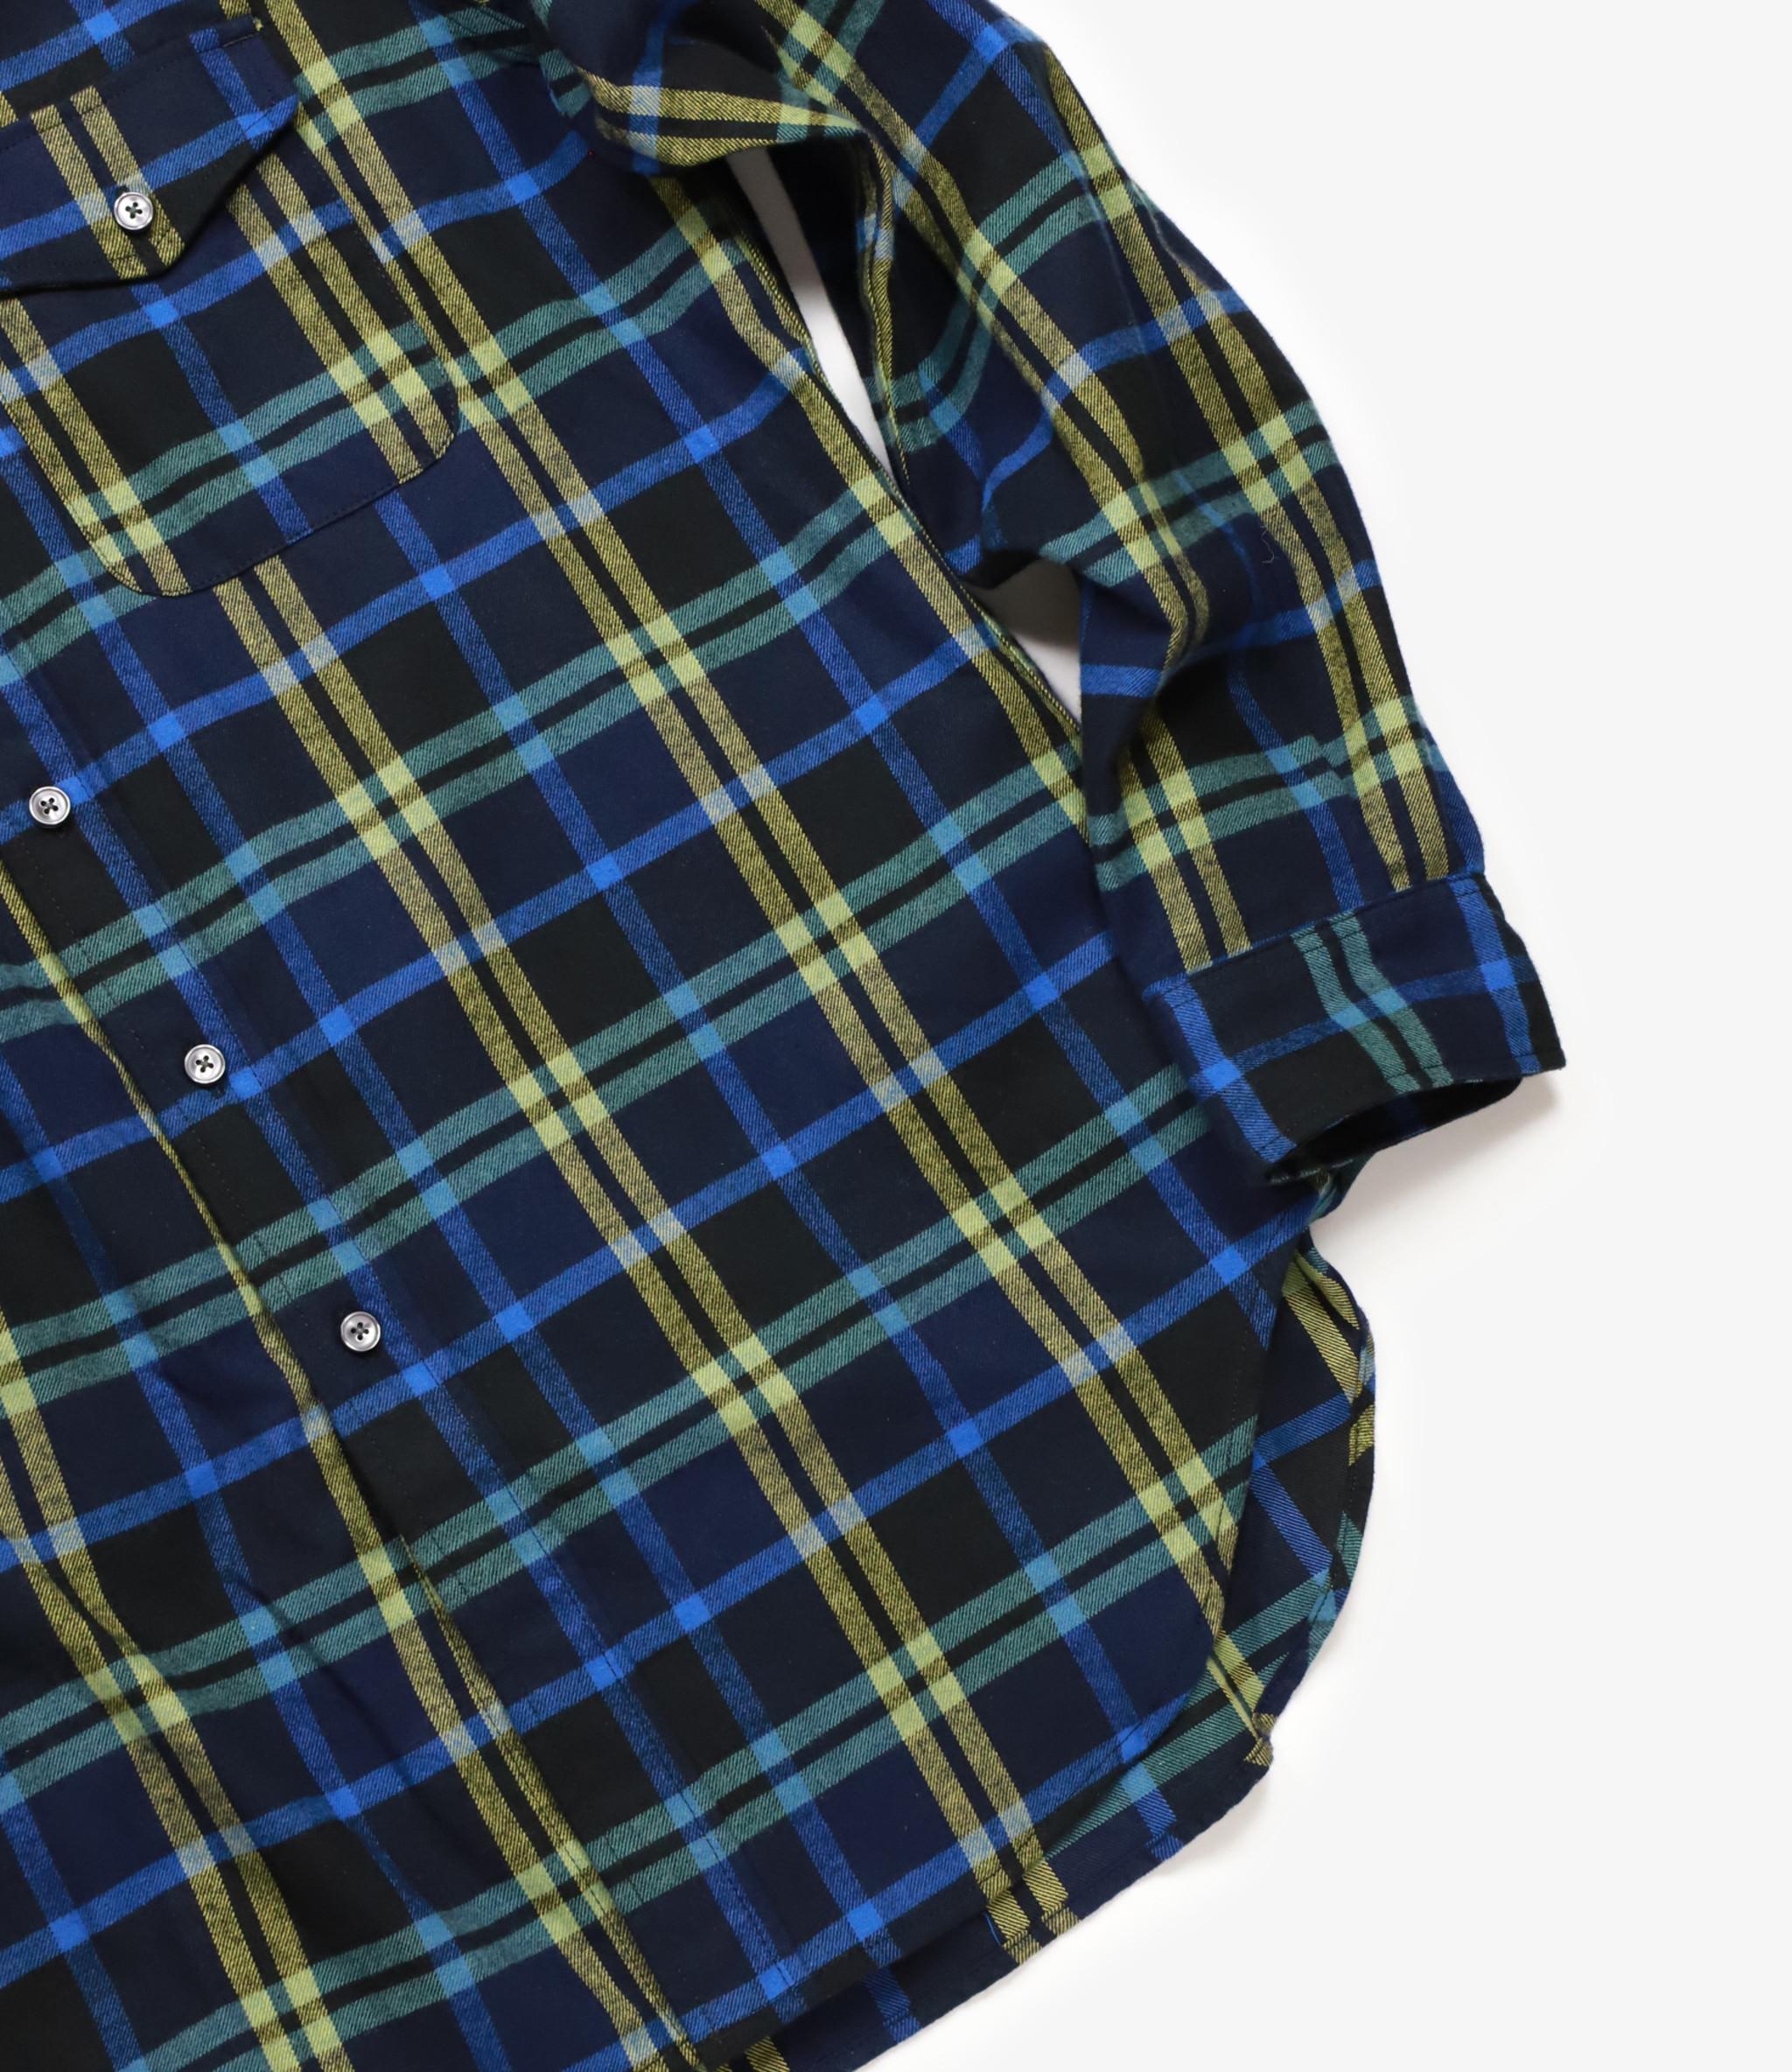 Workaday by Engineered Garments BD Shirt - Dark Navy/Yellow/Blue Plaid Flannel